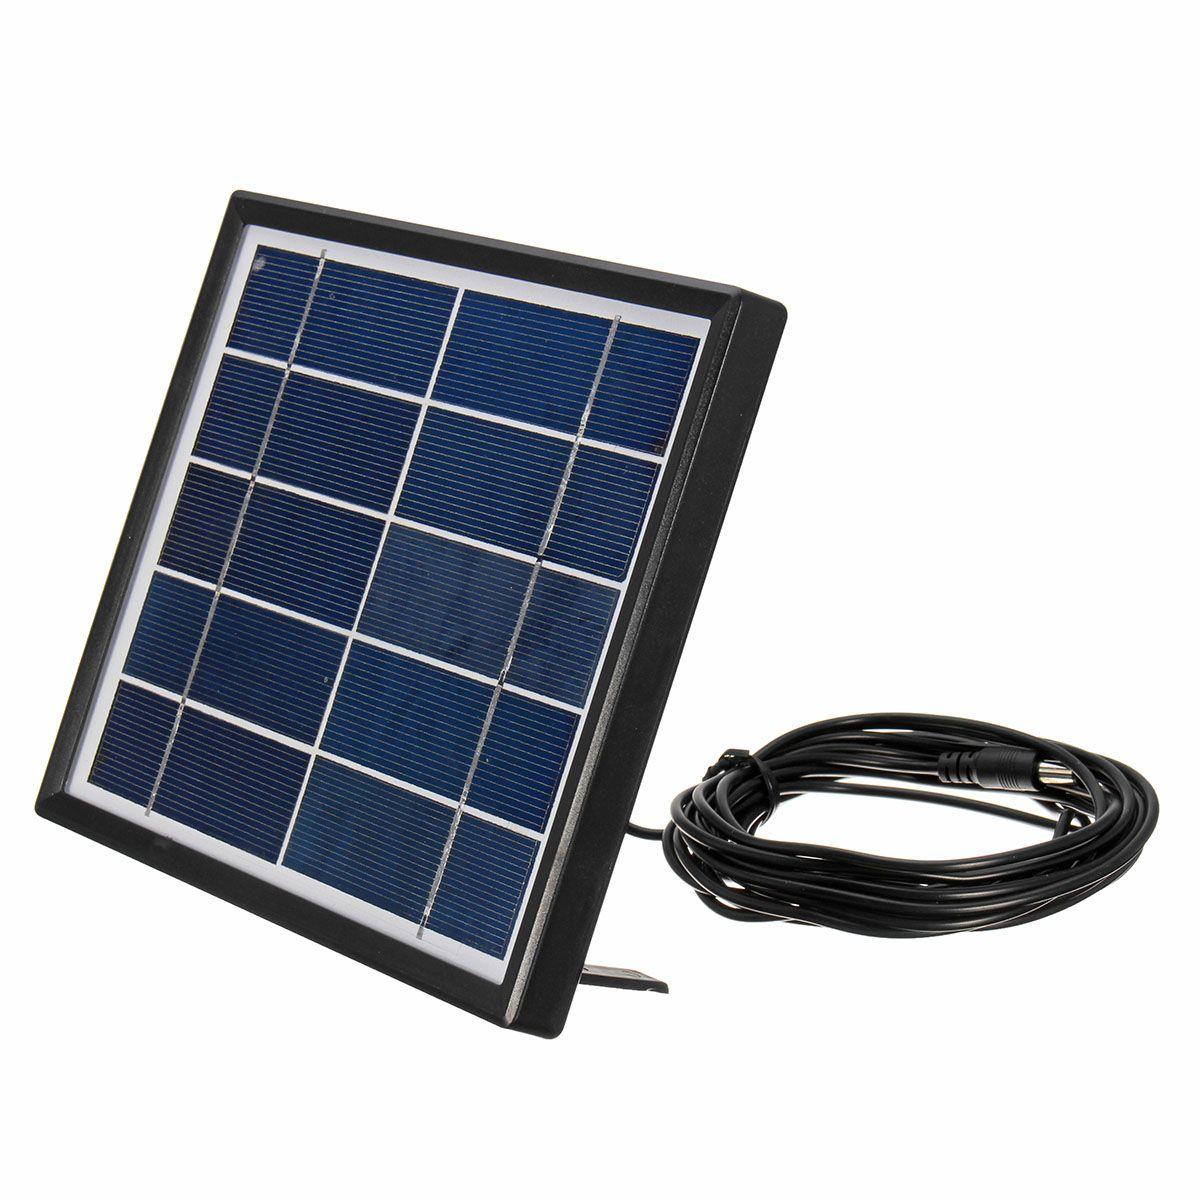 5v 3w 0 6a Rechargable Solar Panel Con Cable De 5 M Para Emergencia Al Aire Libre Solar Panels Solar Diy Kits